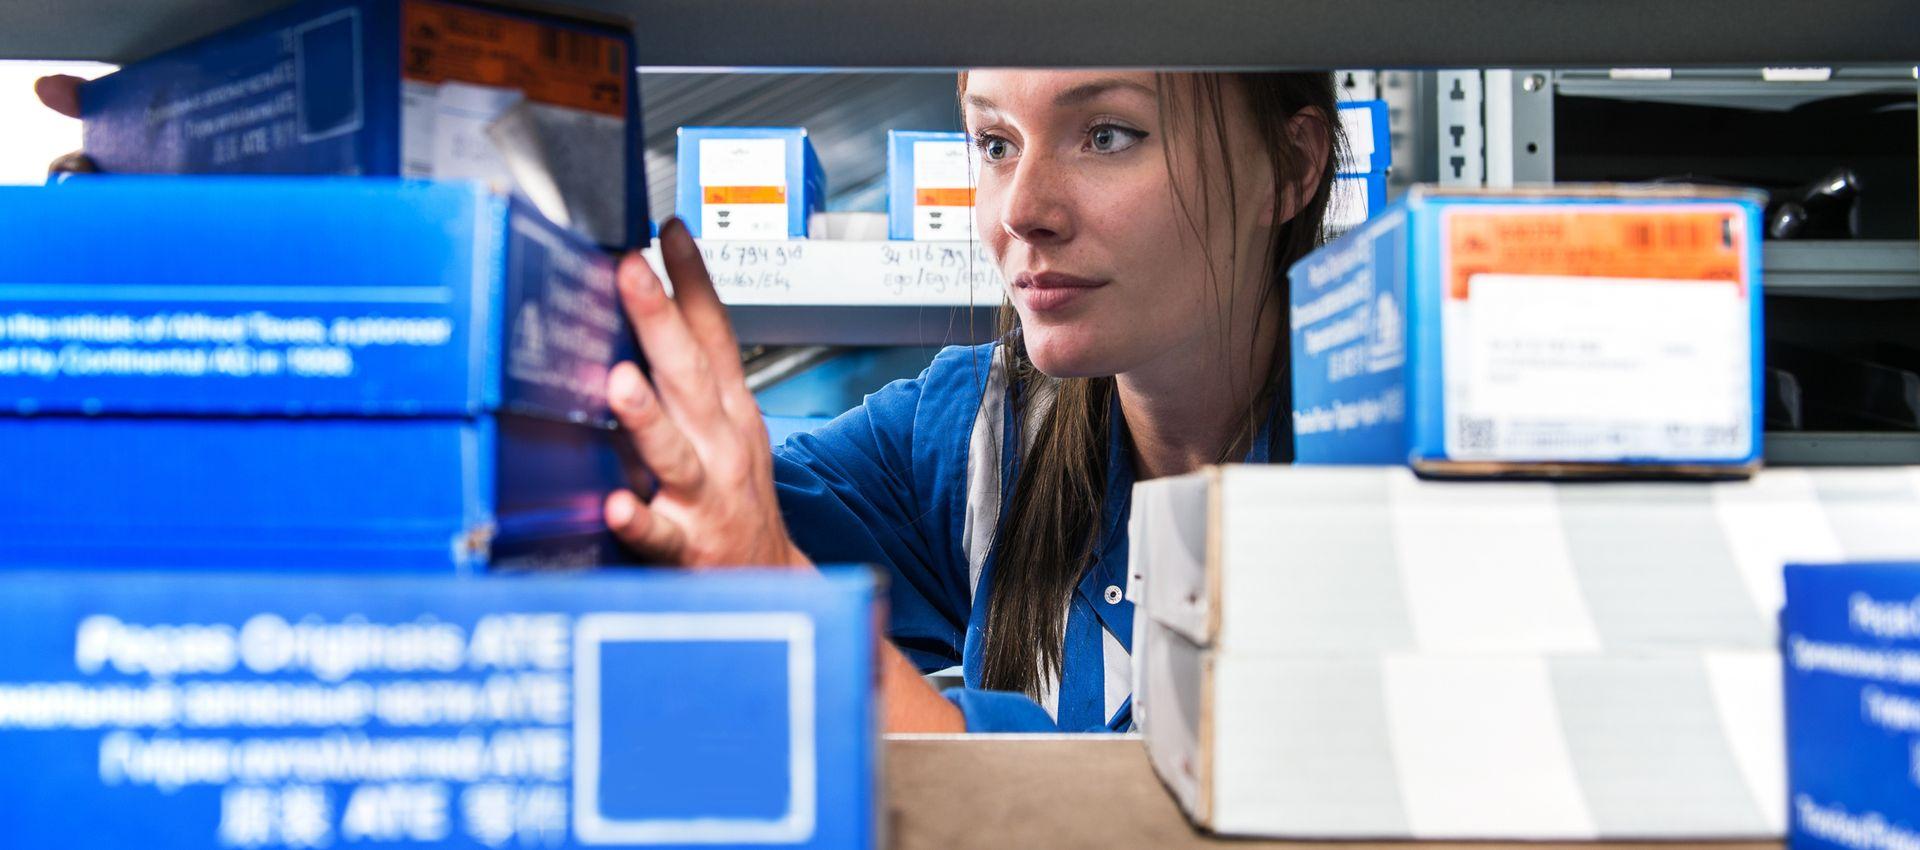 Warehouse Operations: Optimizing the Replenishment Process